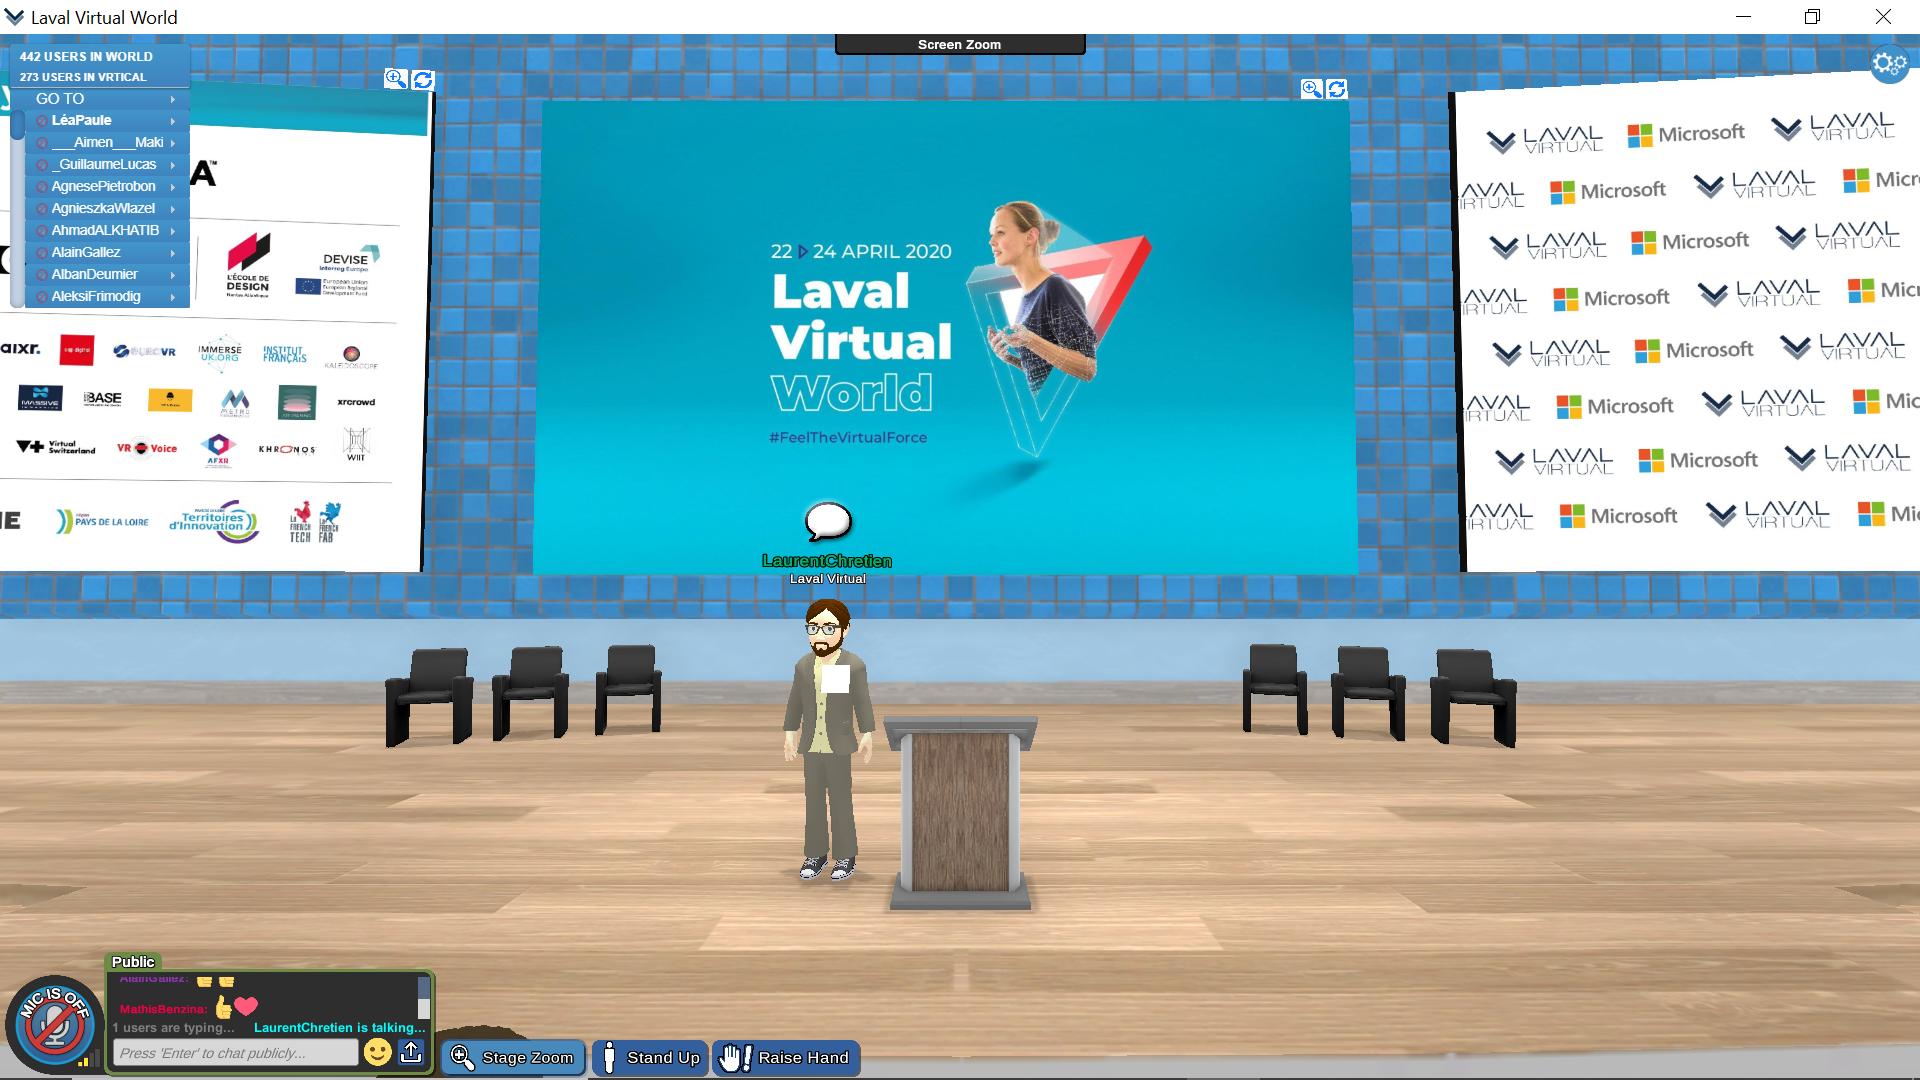 Laurent Chrétien in the Laval Virtual World